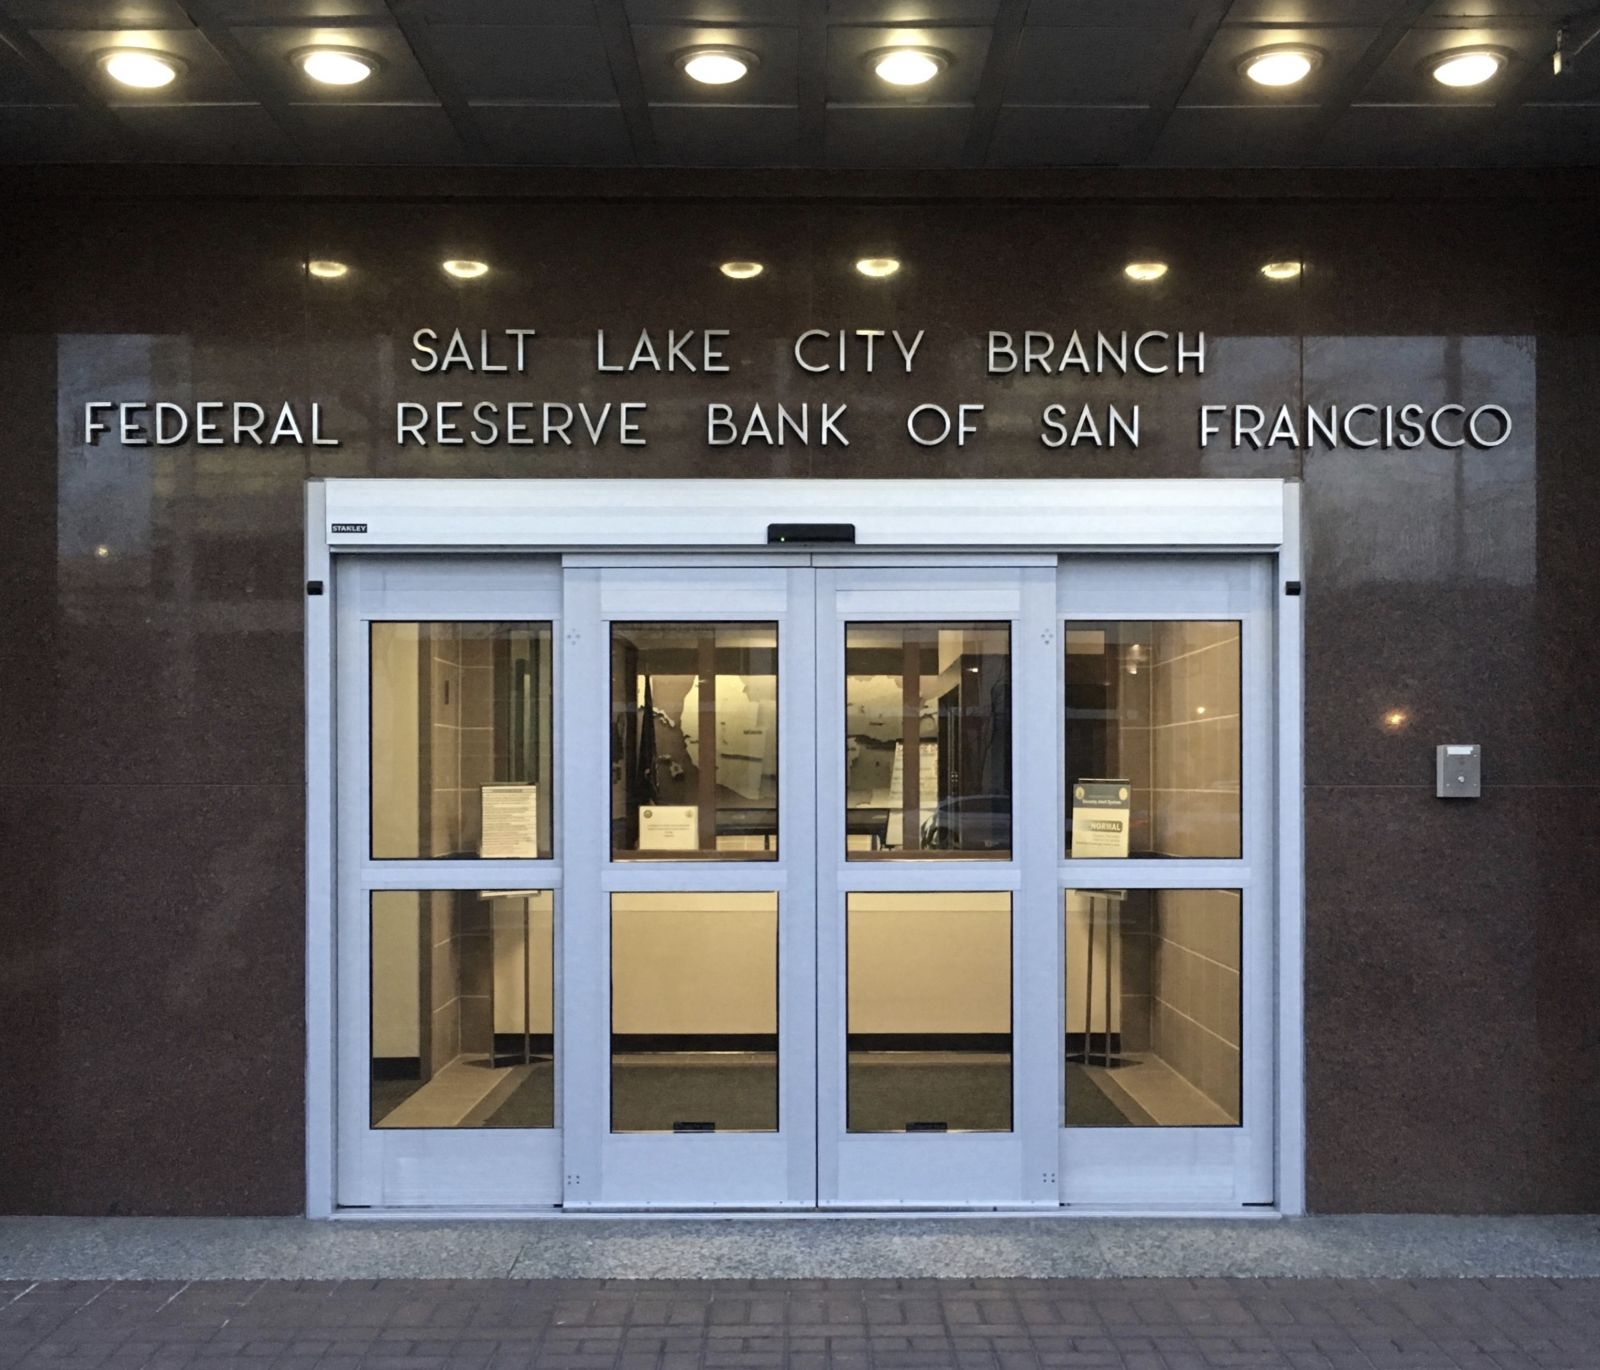 Salt Lake City Branch Federal Reserve Bank of San Francisco   Flickr - Photo Sharing!